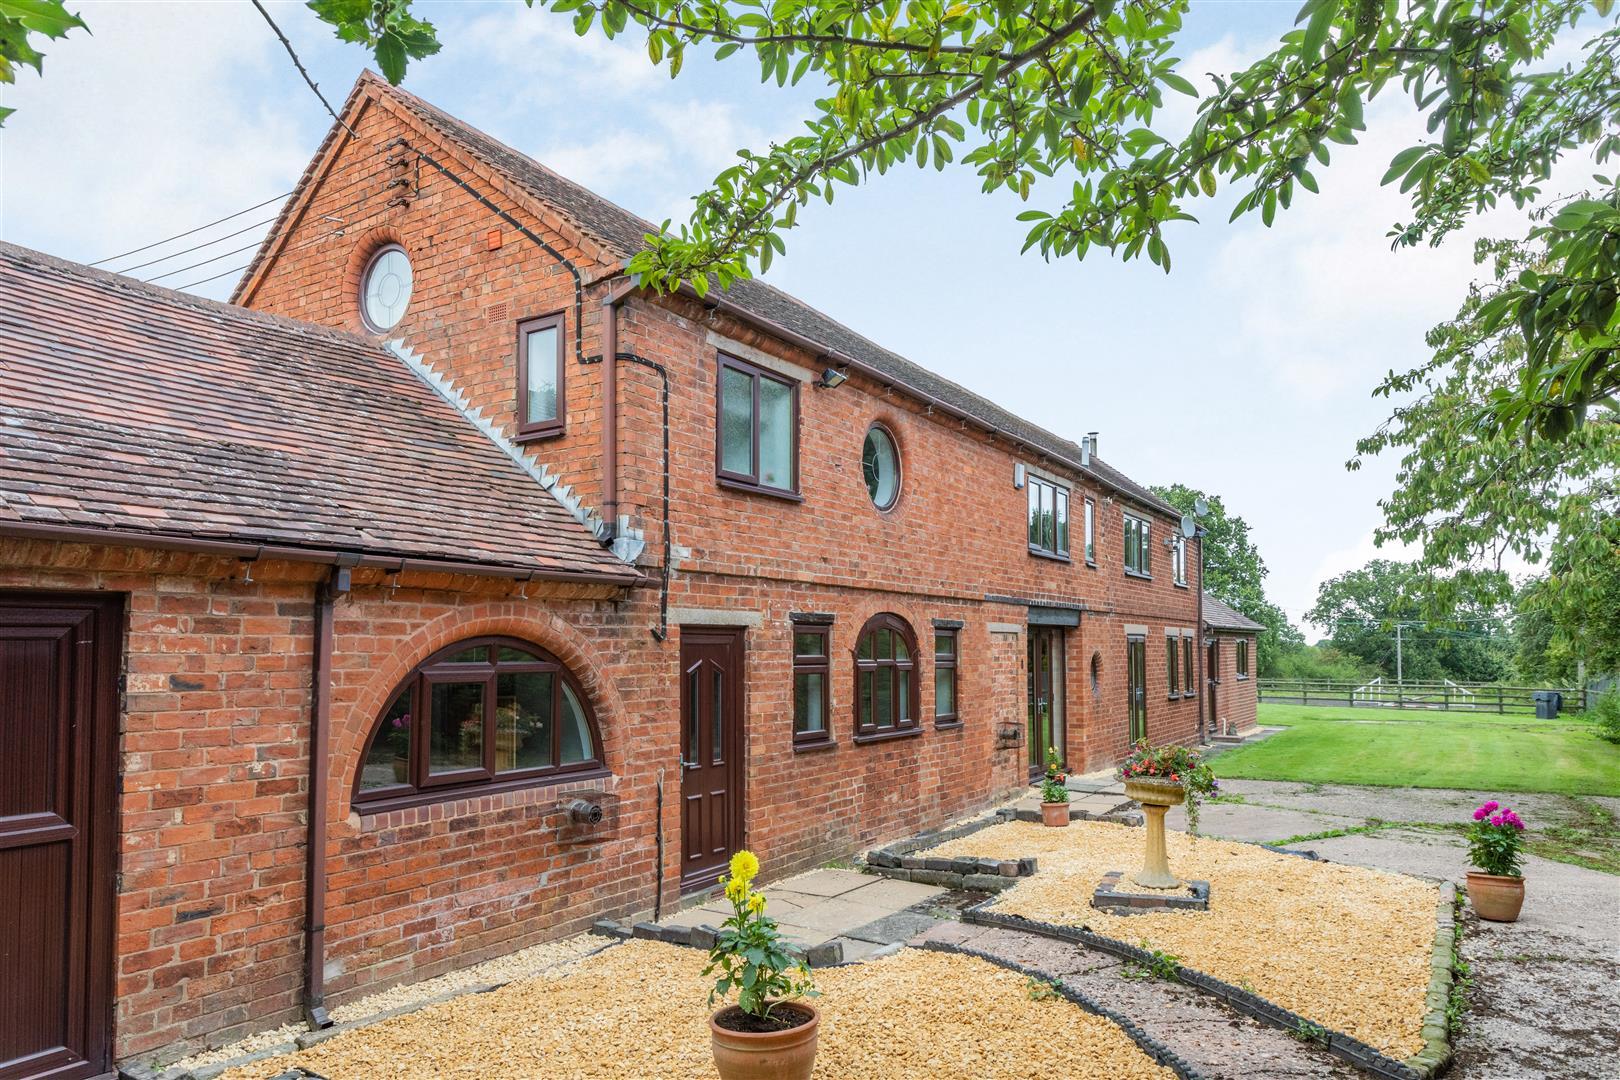 Property for sale near Birmingham